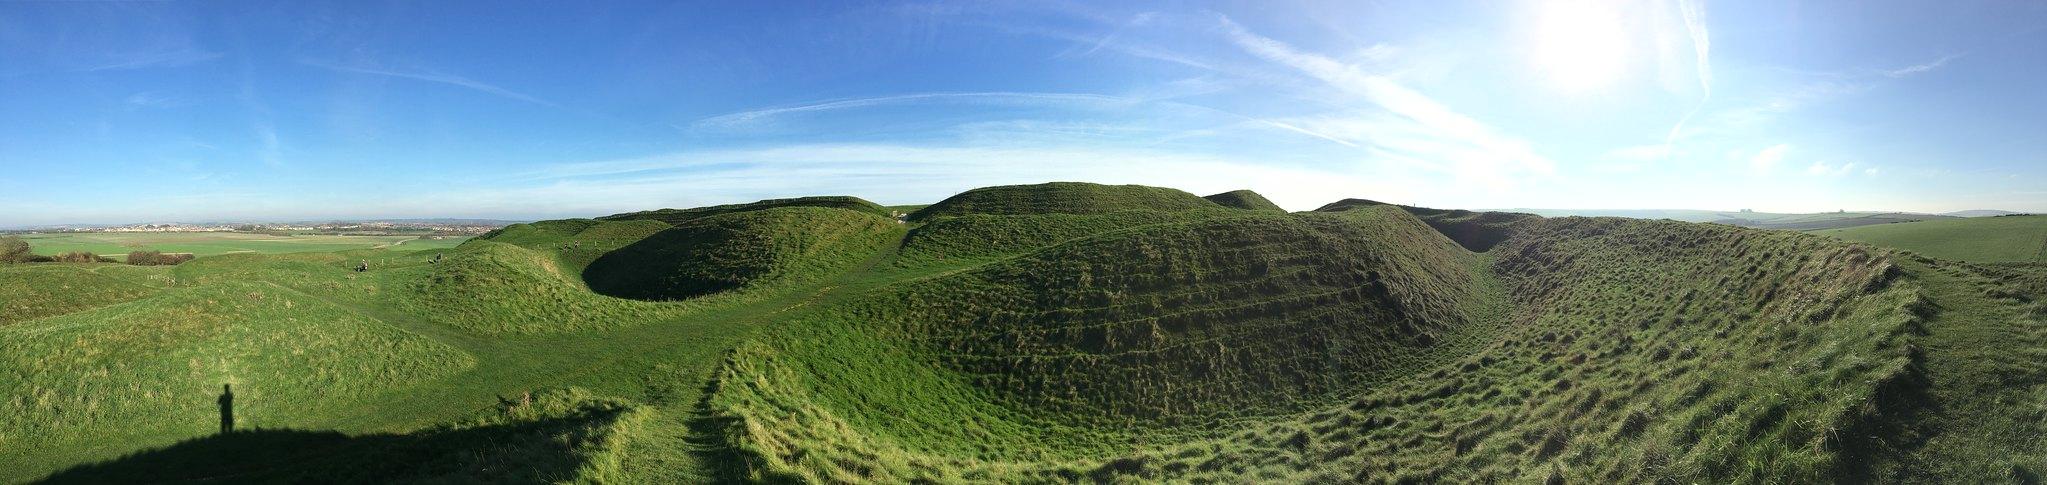 Maiden Castle | The Monmouth Rebellion in Dorset